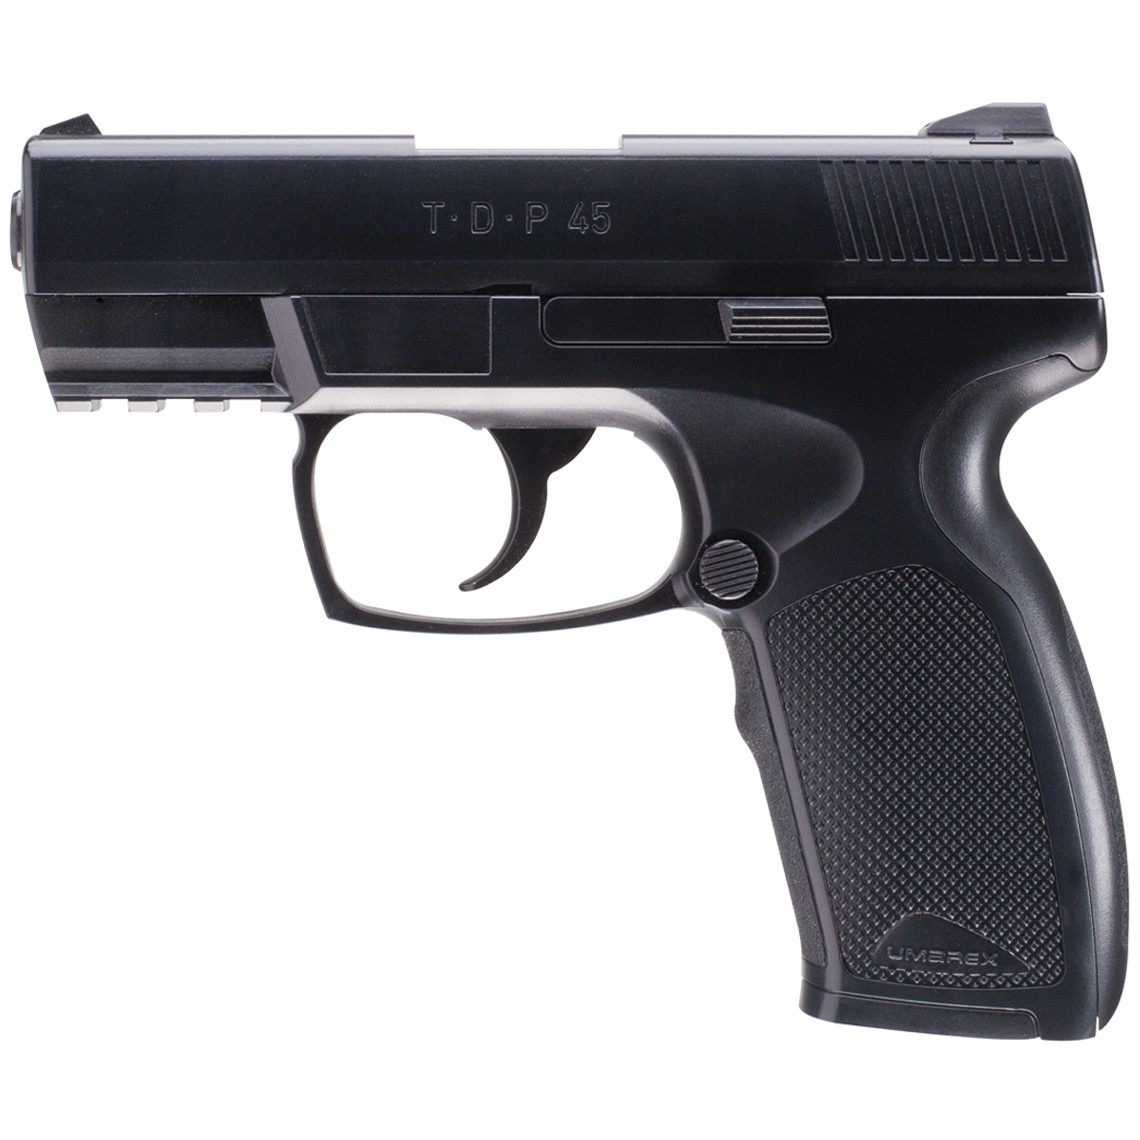 Pistola Umarex TDP45